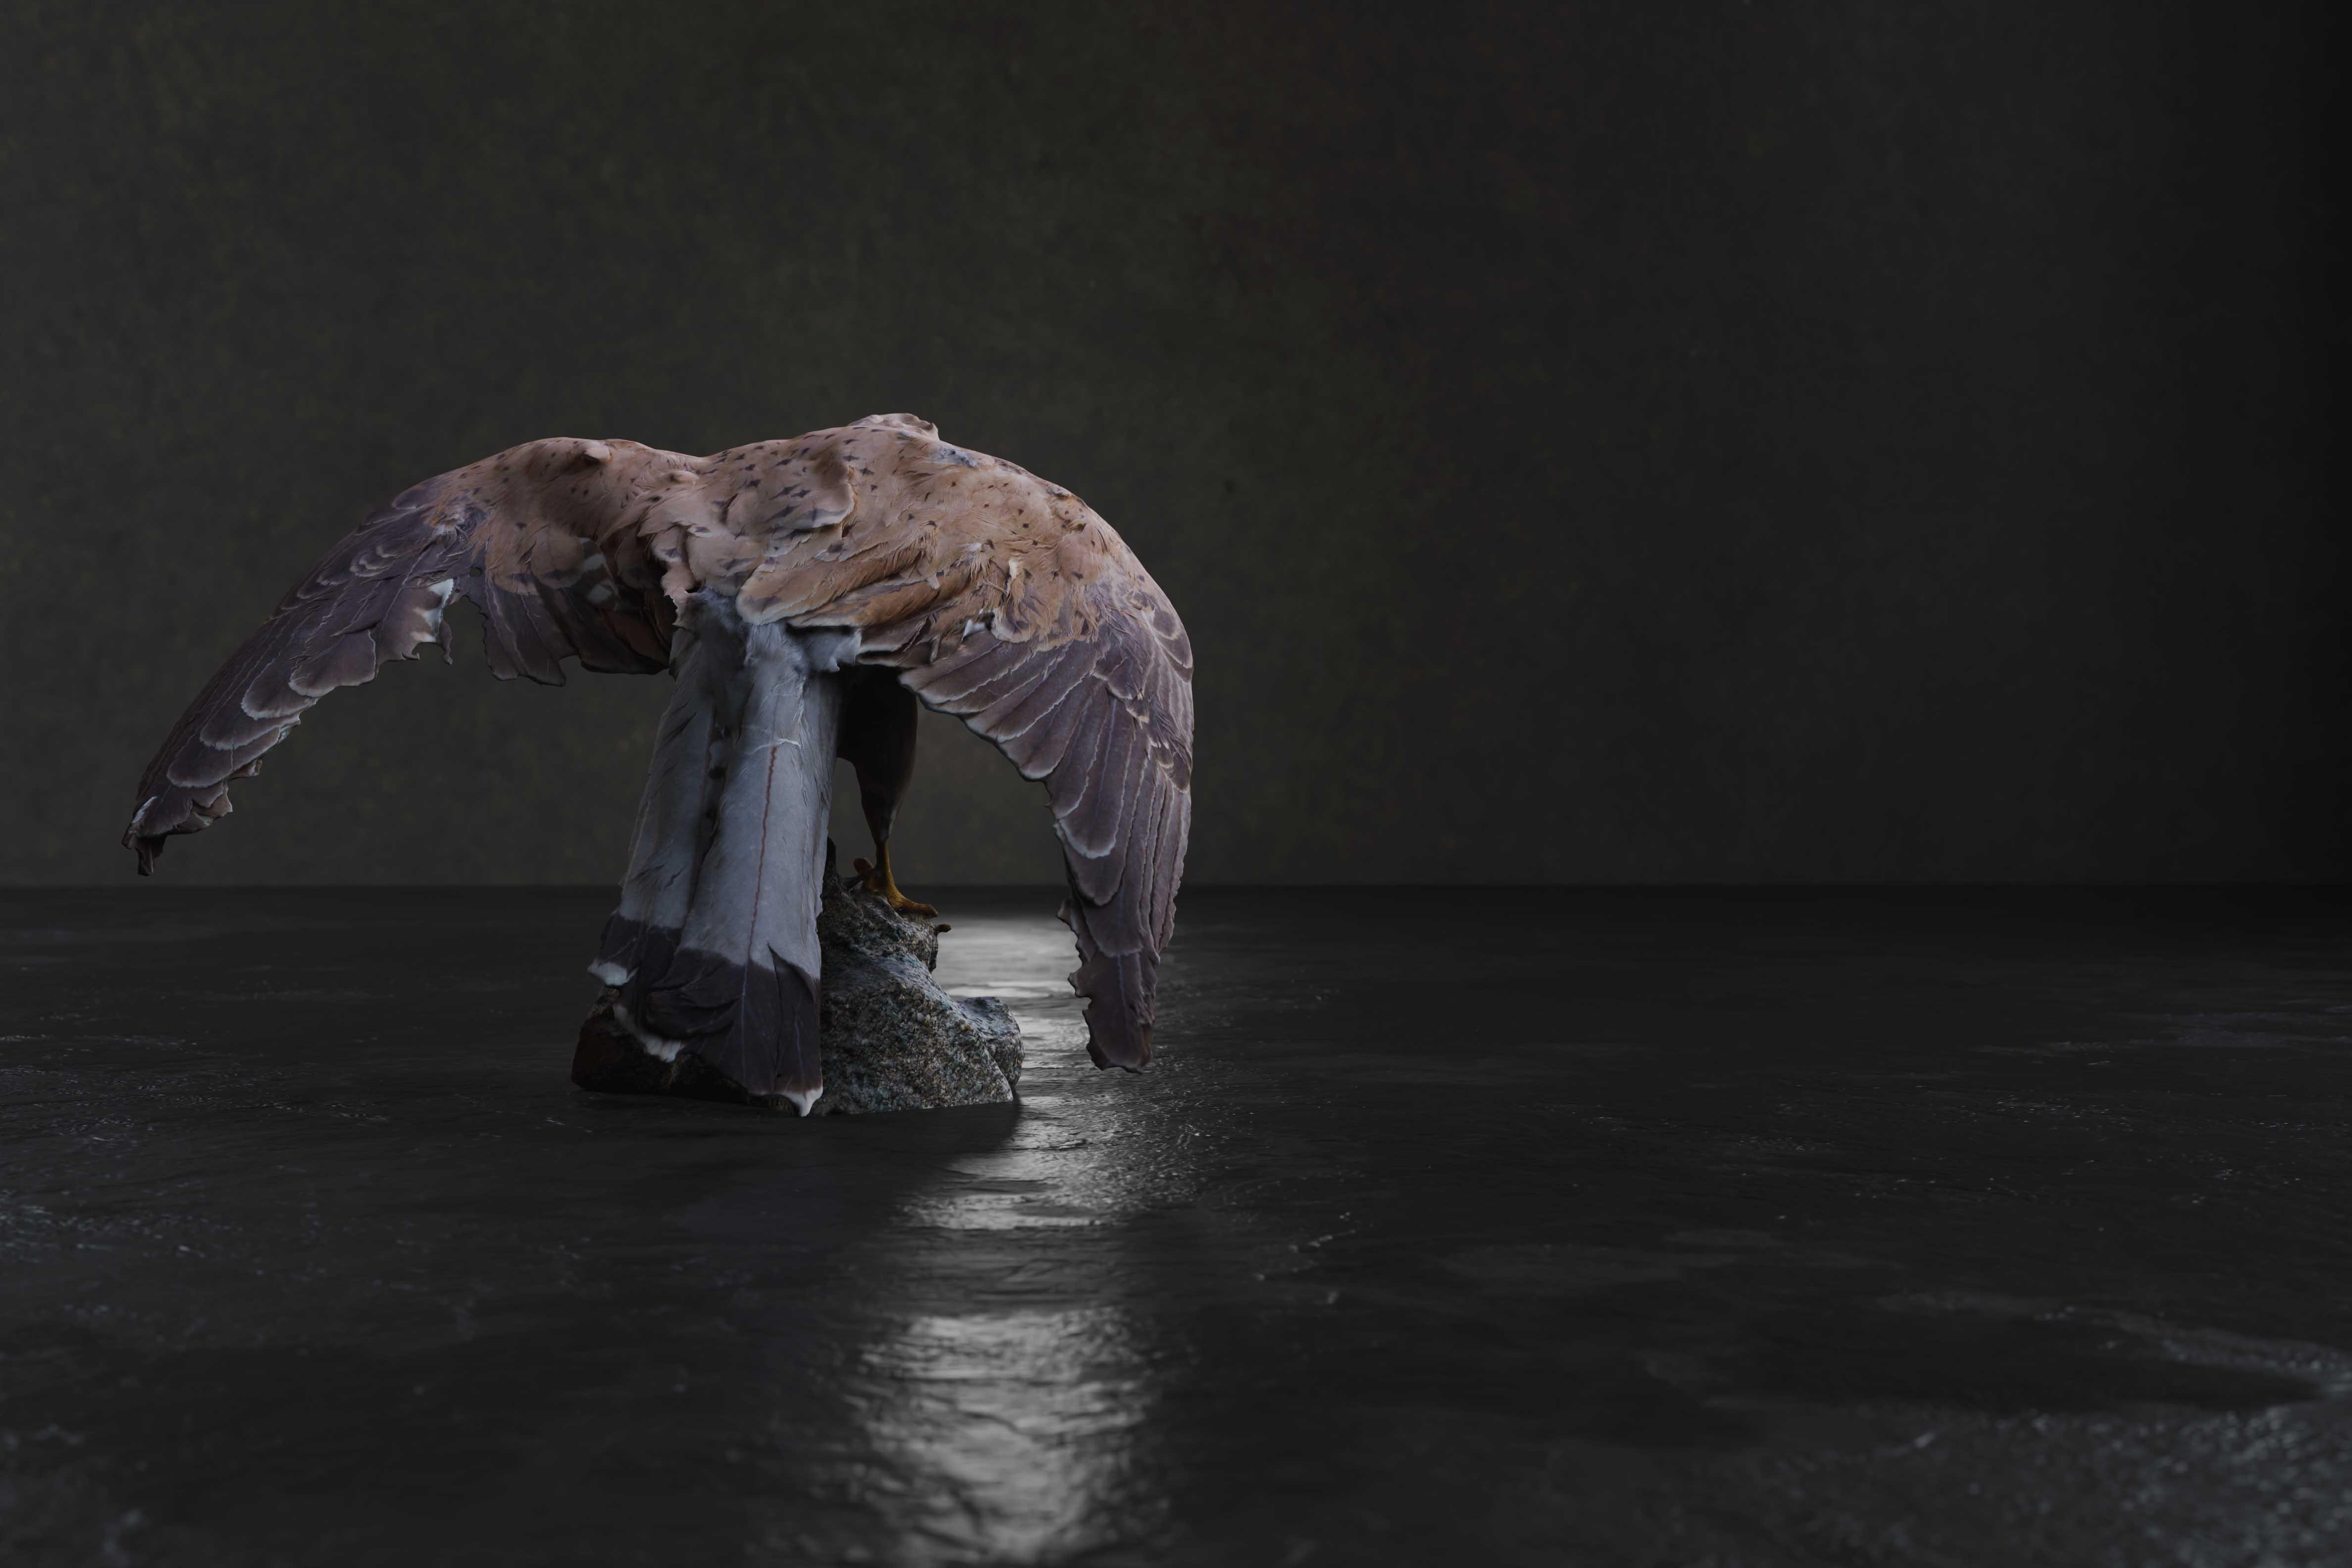 Realistic Kestrel Bird - 2